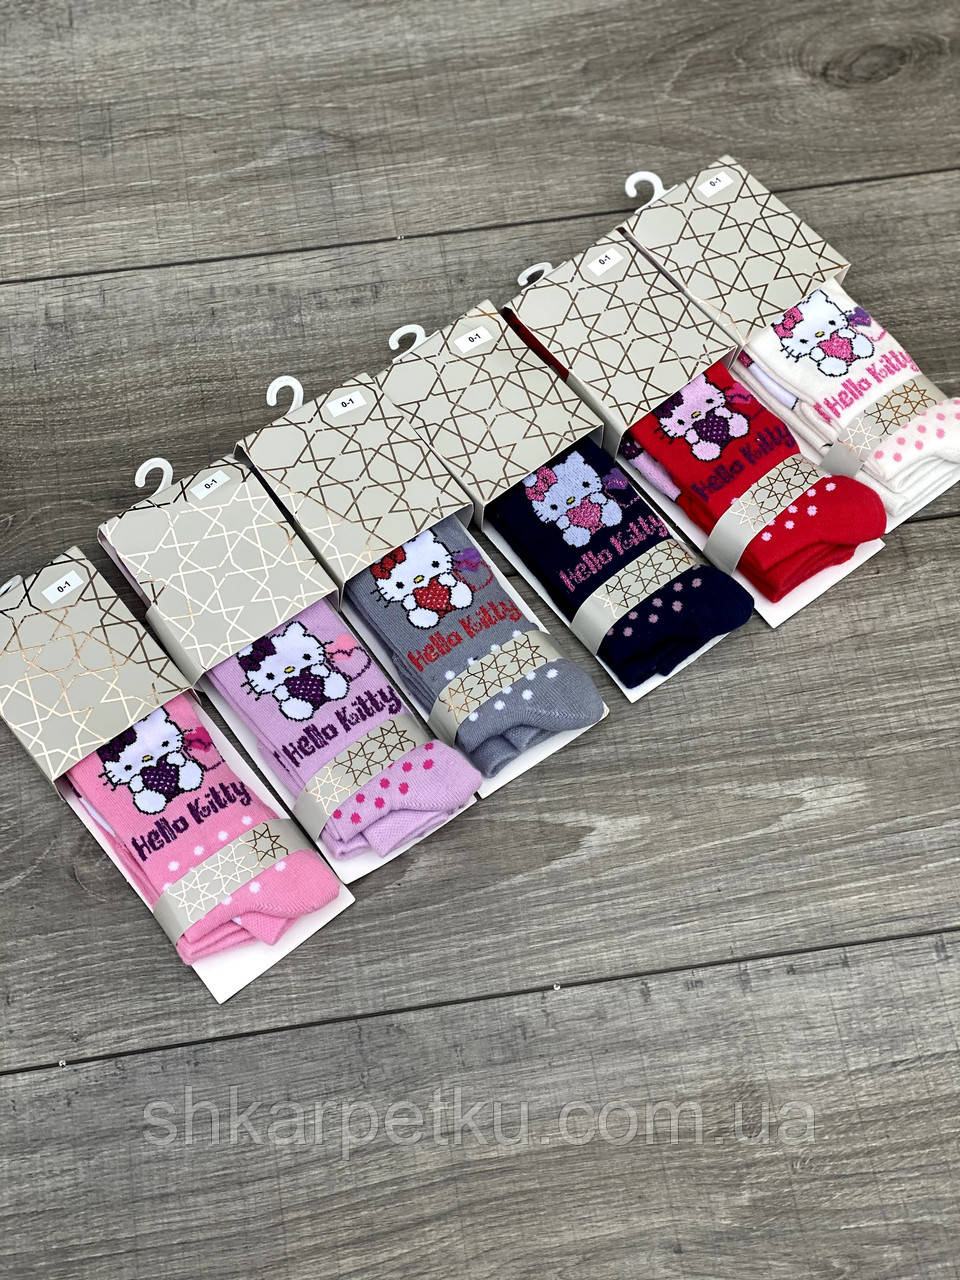 Колготы для младенцев хлопок KBS Hello Kitty Хеллоу Китти с кошками для девочек 6 шт в уп микс из 3х кол